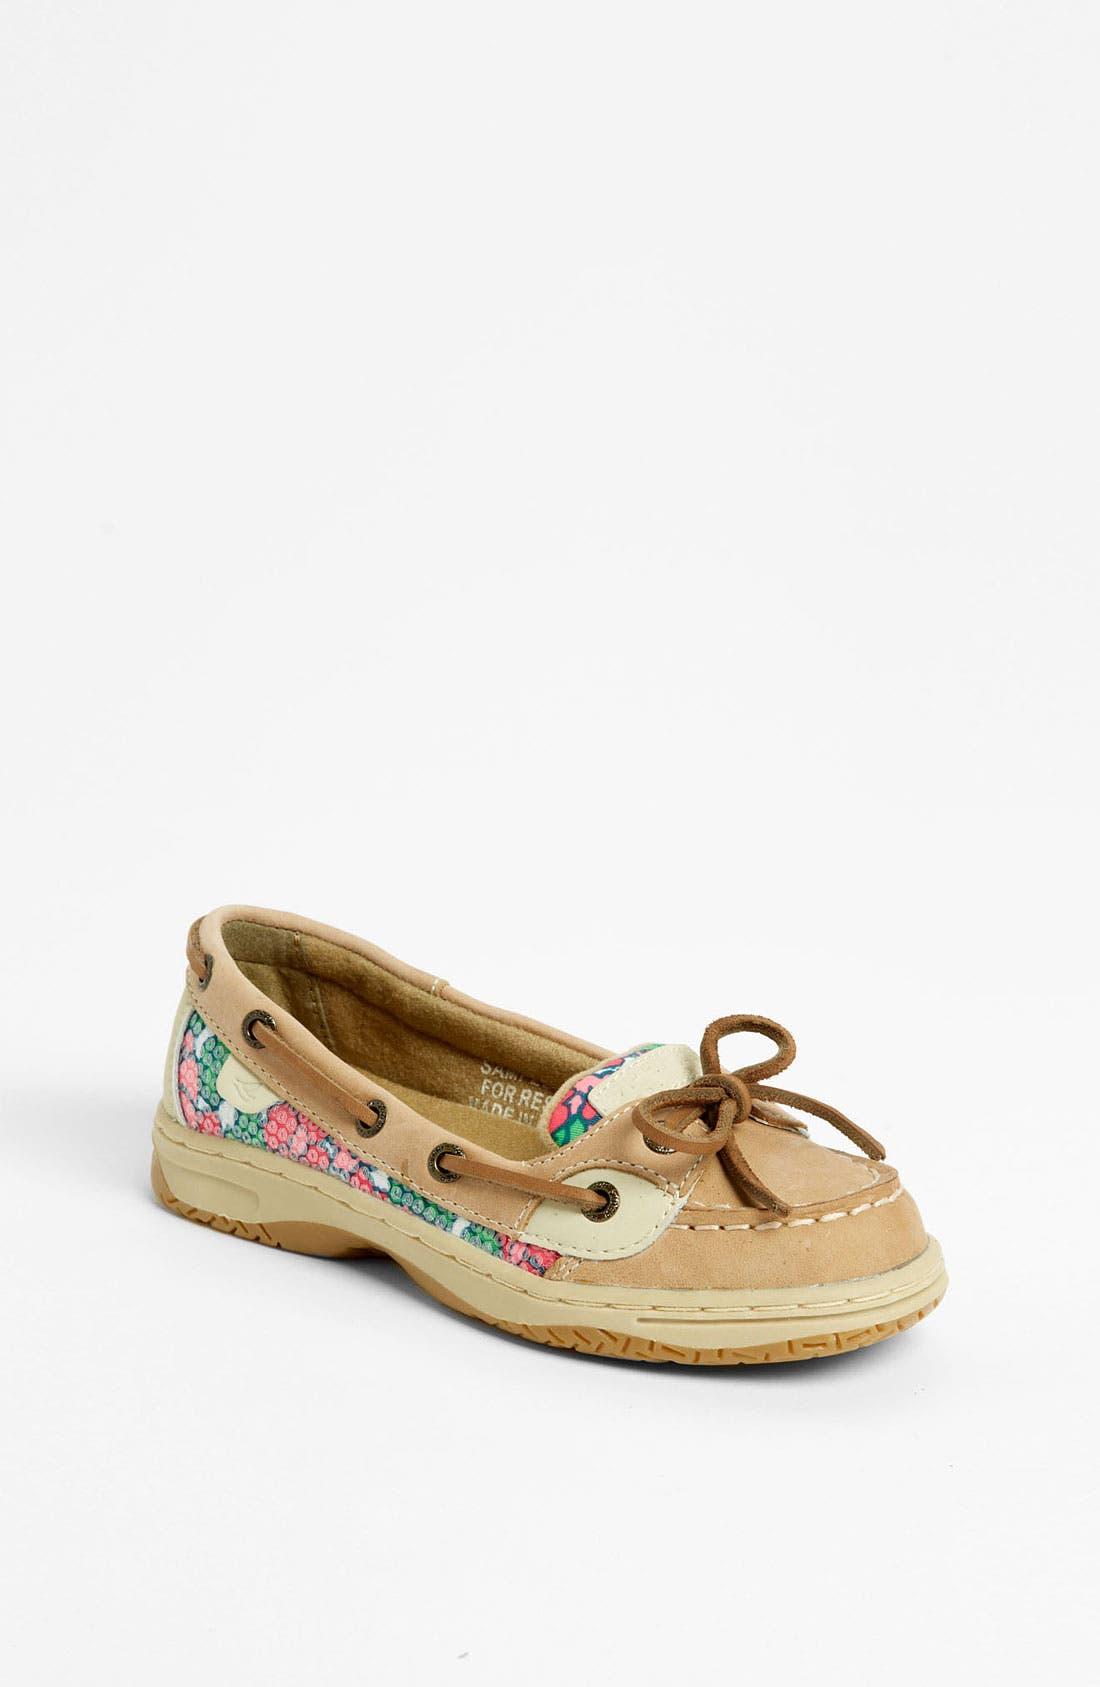 Main Image - Sperry Top-Sider® 'Angelfish' Boat Shoe (Little Kid & Big Kid)